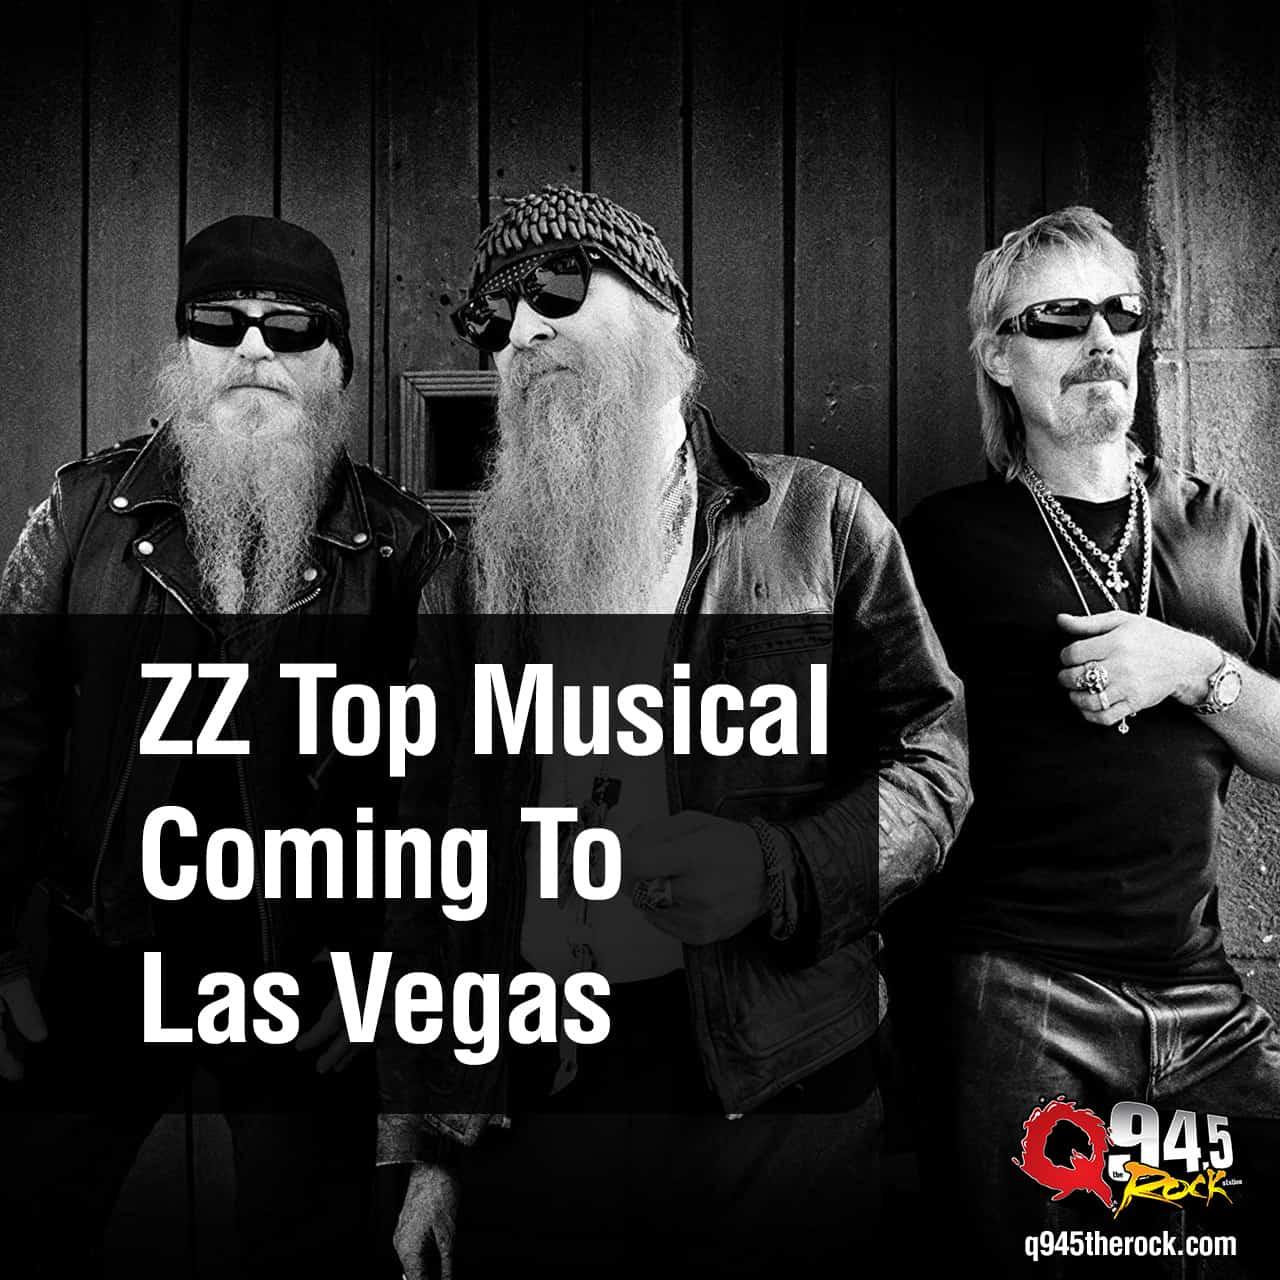 ZZ Top Musical Coming To Las Vegas